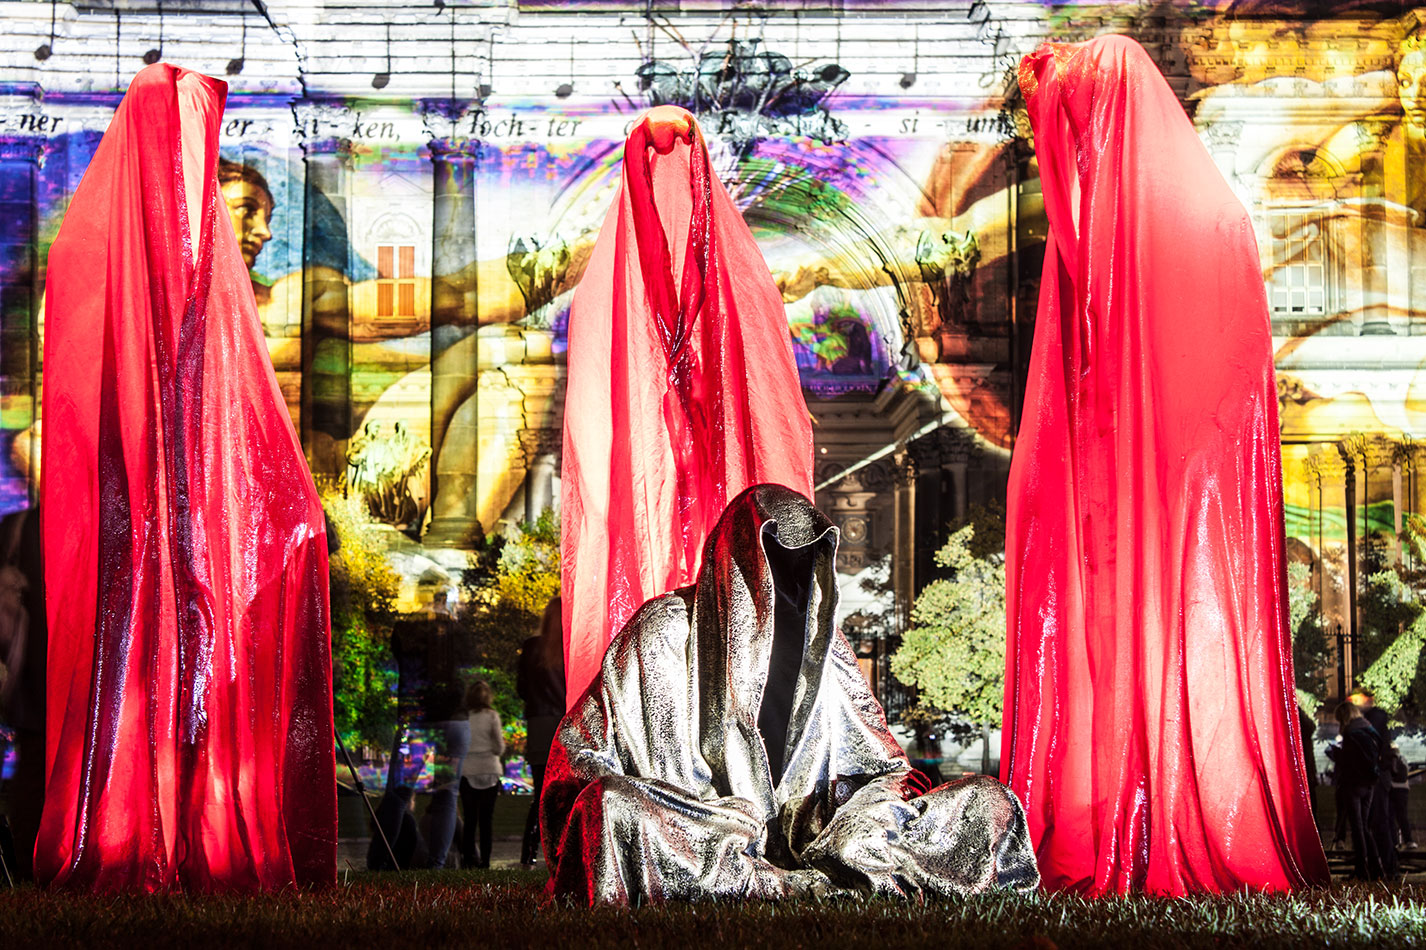 festival-of-lights-old-museum-cathedral-berlin-light-art-show-exhibition-lumina-guardians-of-time-manfred-kili-kielnhofer-contemporary-arts-design-sculpture-3052